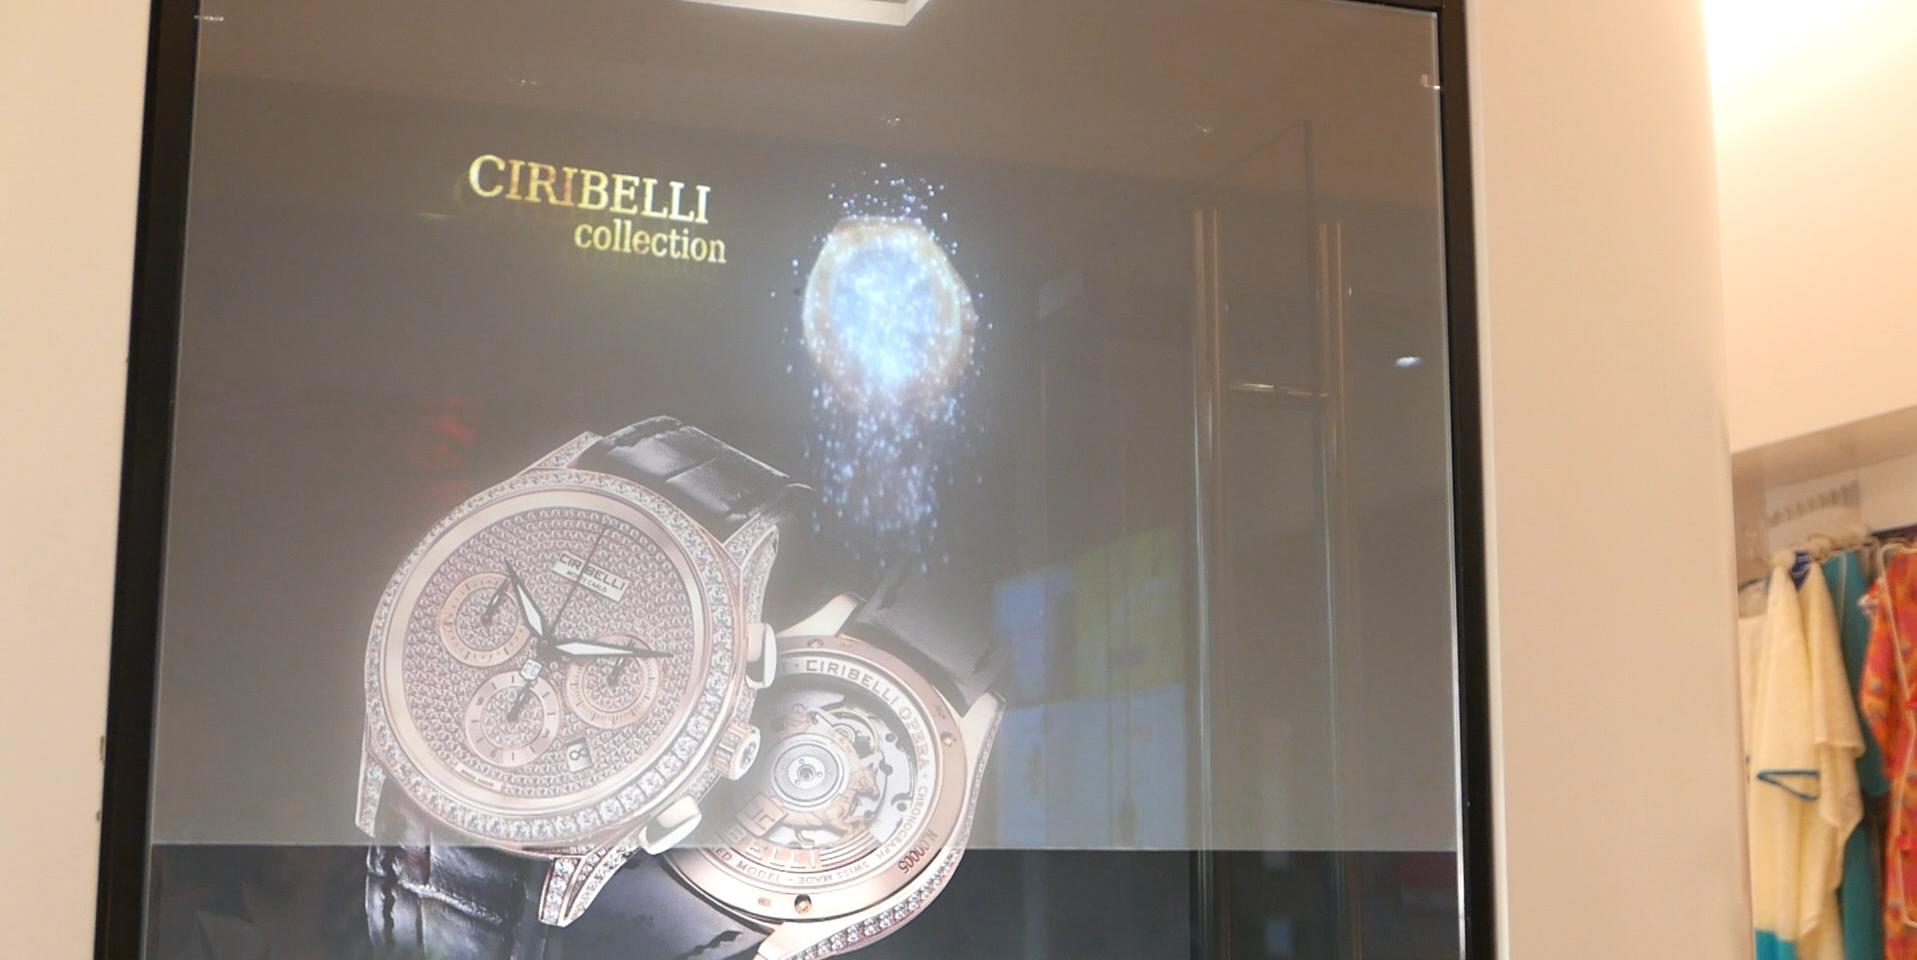 hologramme montre